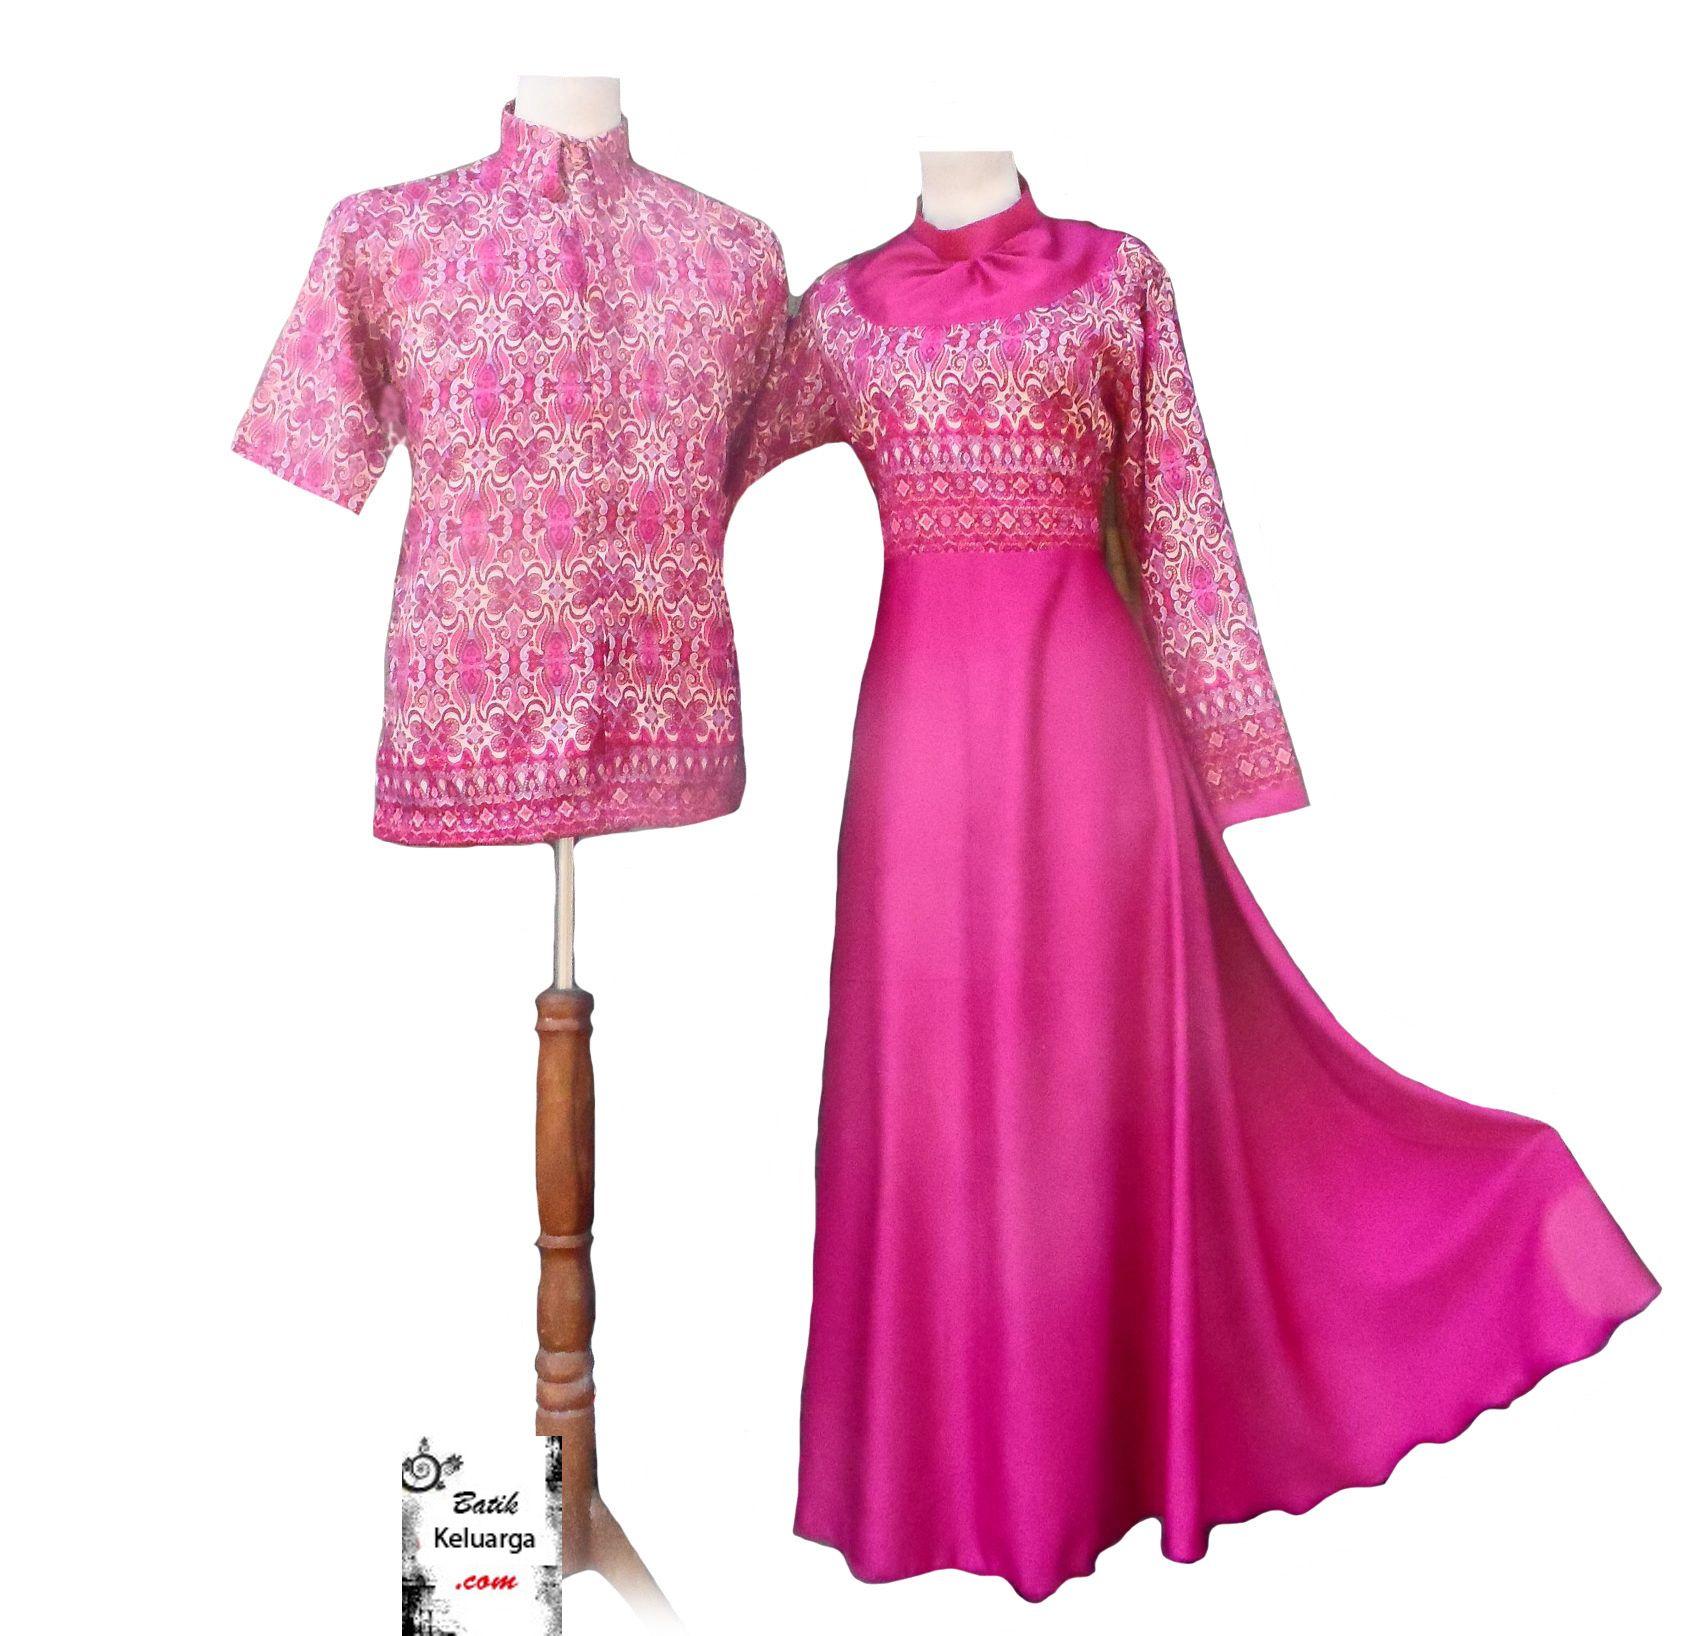 Baju Pesta Suami Istri Batik Keluarga Pinterest